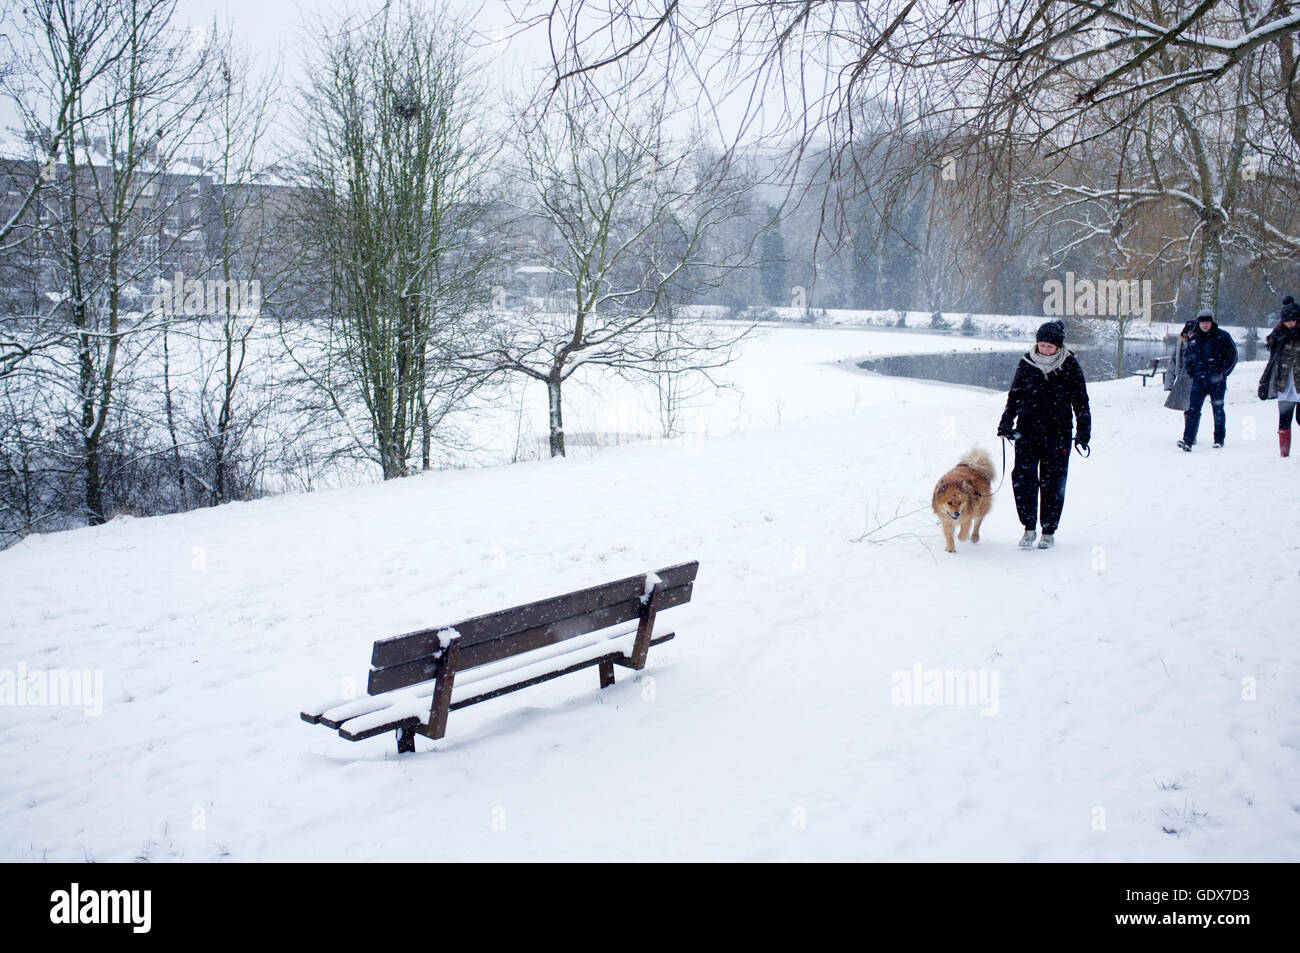 Dog walking amidst a snow covered landscape on Hampstead Heath London, England UK. - Stock Image